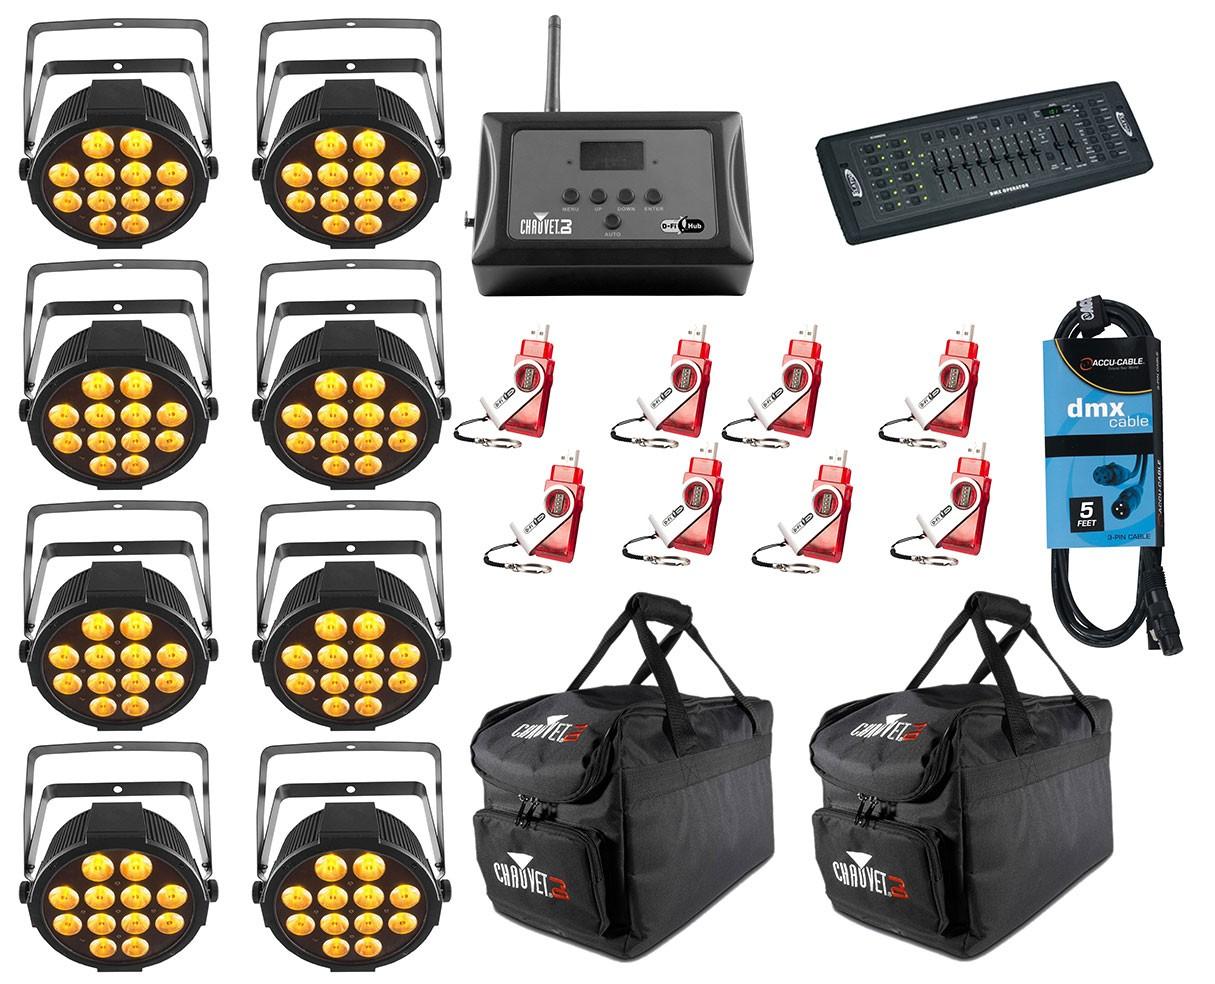 8x CHAUVET DJ SlimPAR Q12 USB + D-Fi 8-Pack with Hub + Controller + Cable + Bags